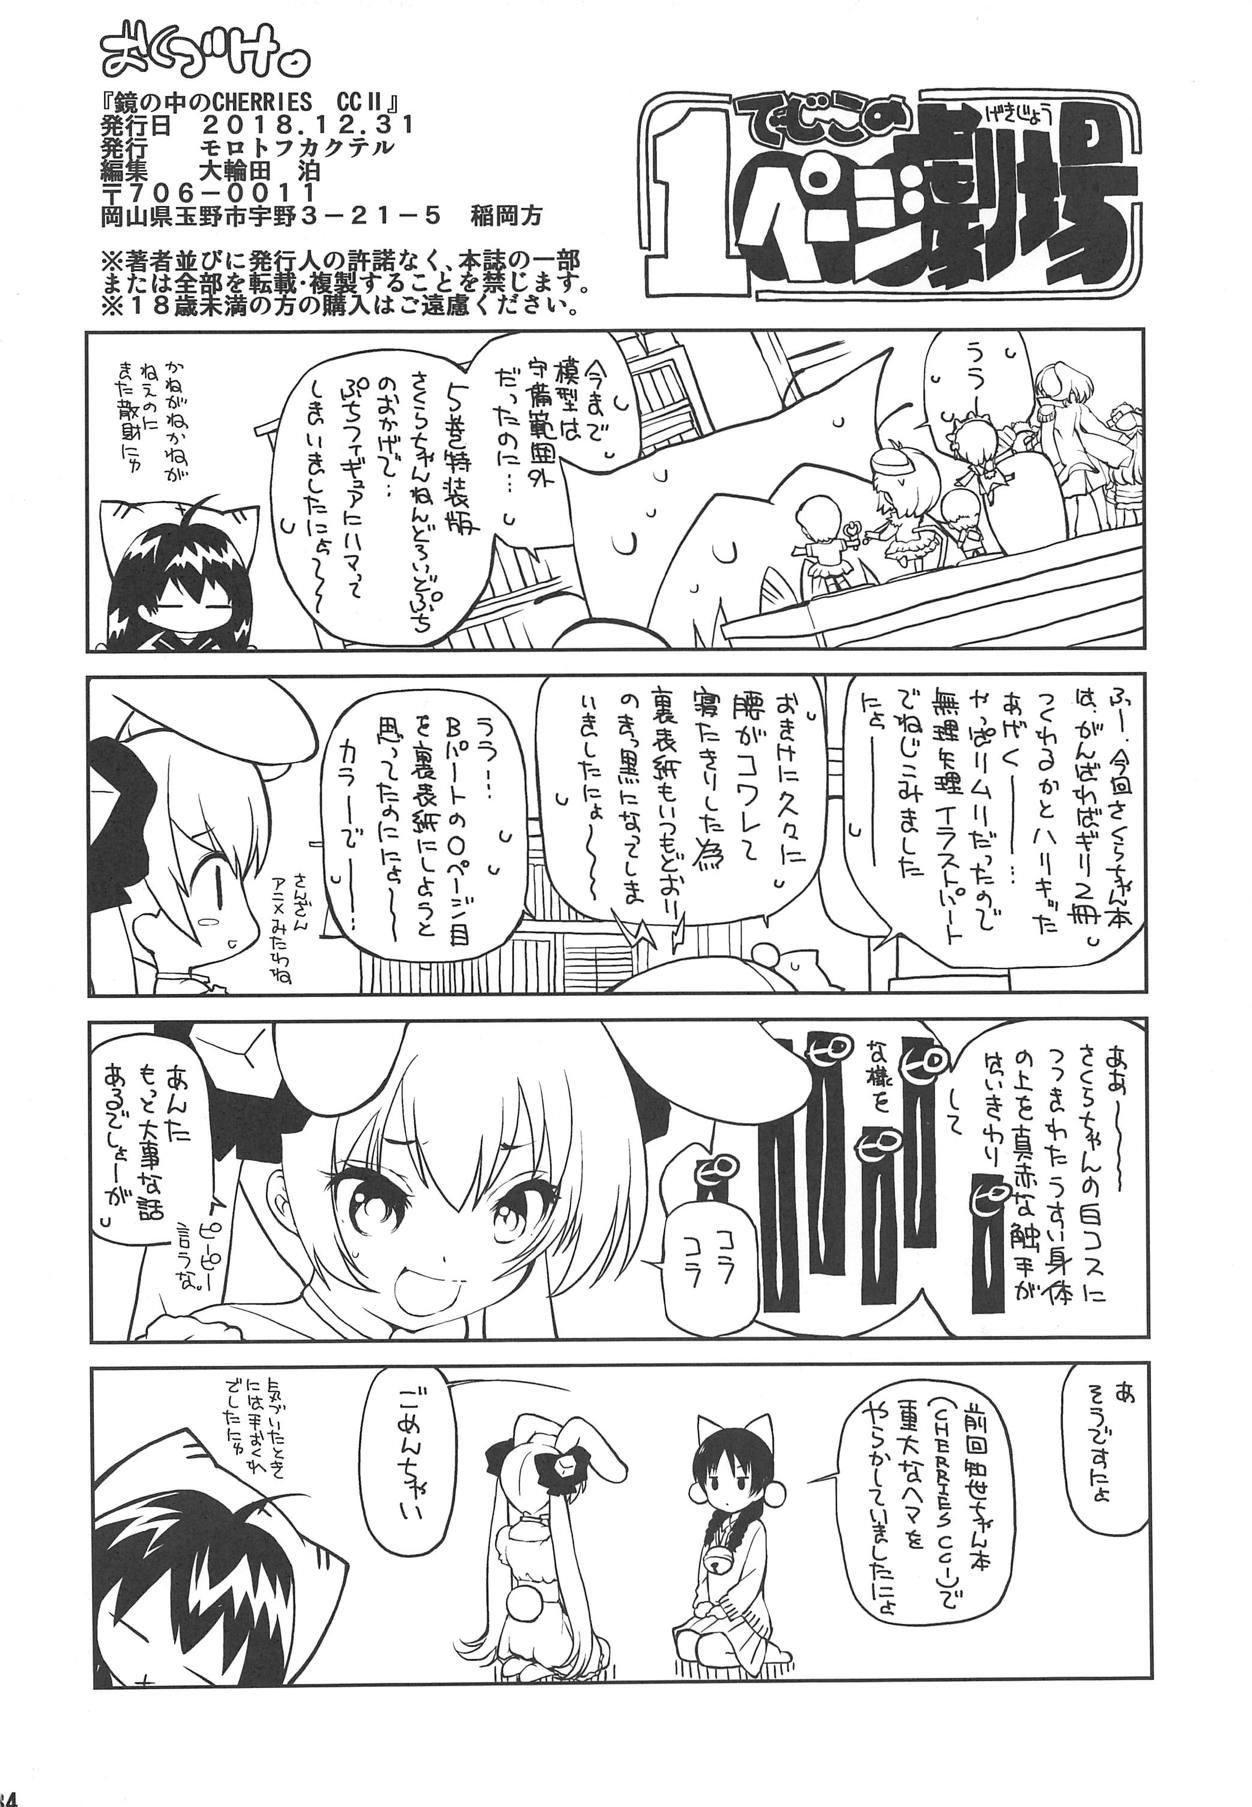 Kagami no Naka no CHERRIES CC II 32